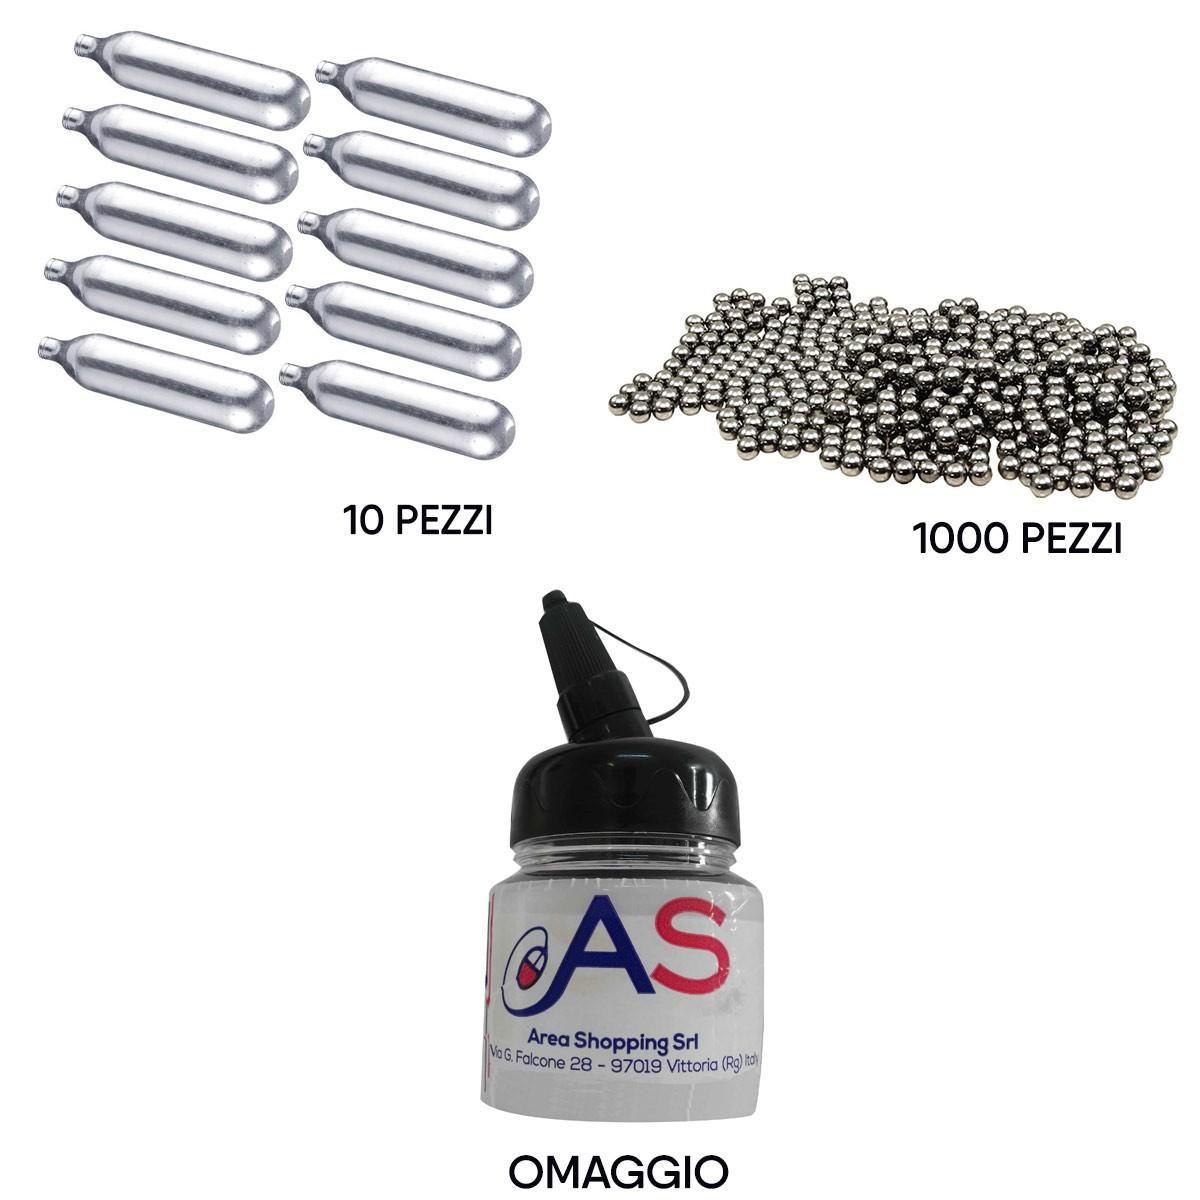 Kit Softair 10 Bombolette CO2 + 1000 Pallini Metallo 6 mm + Barattolo Omaggio